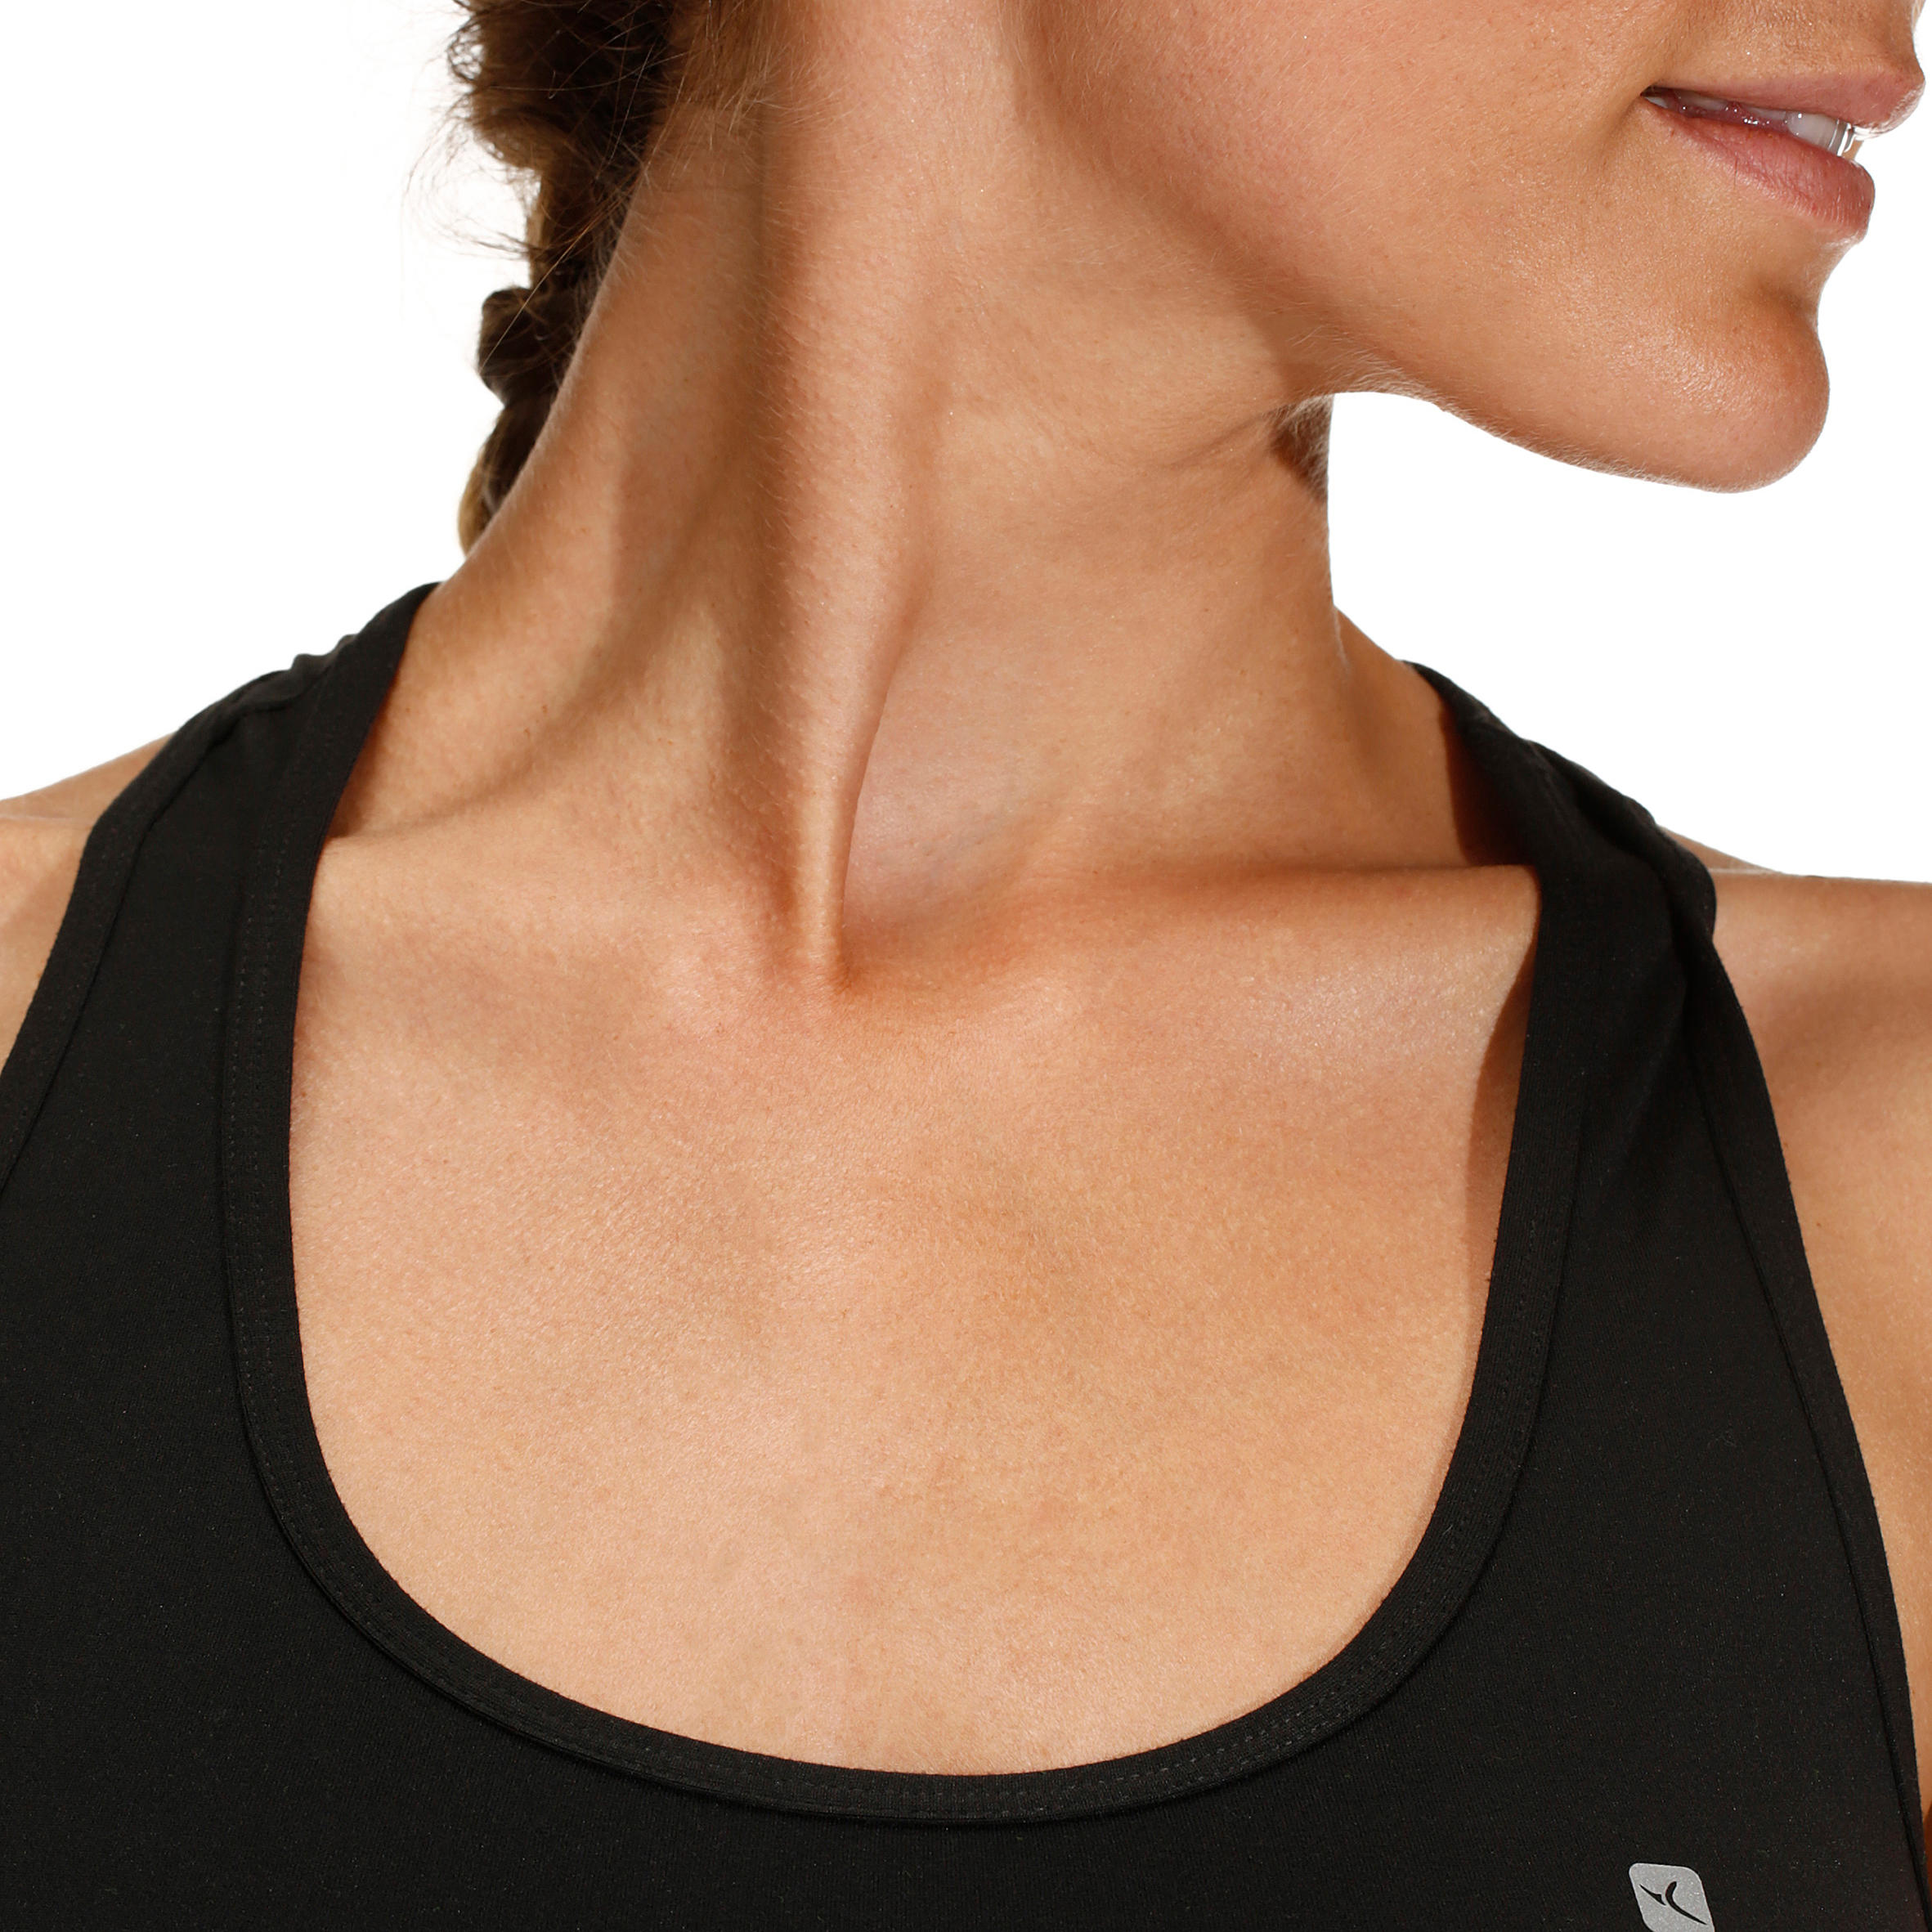 100 Women's Cardio Fitness Tank Top - Black